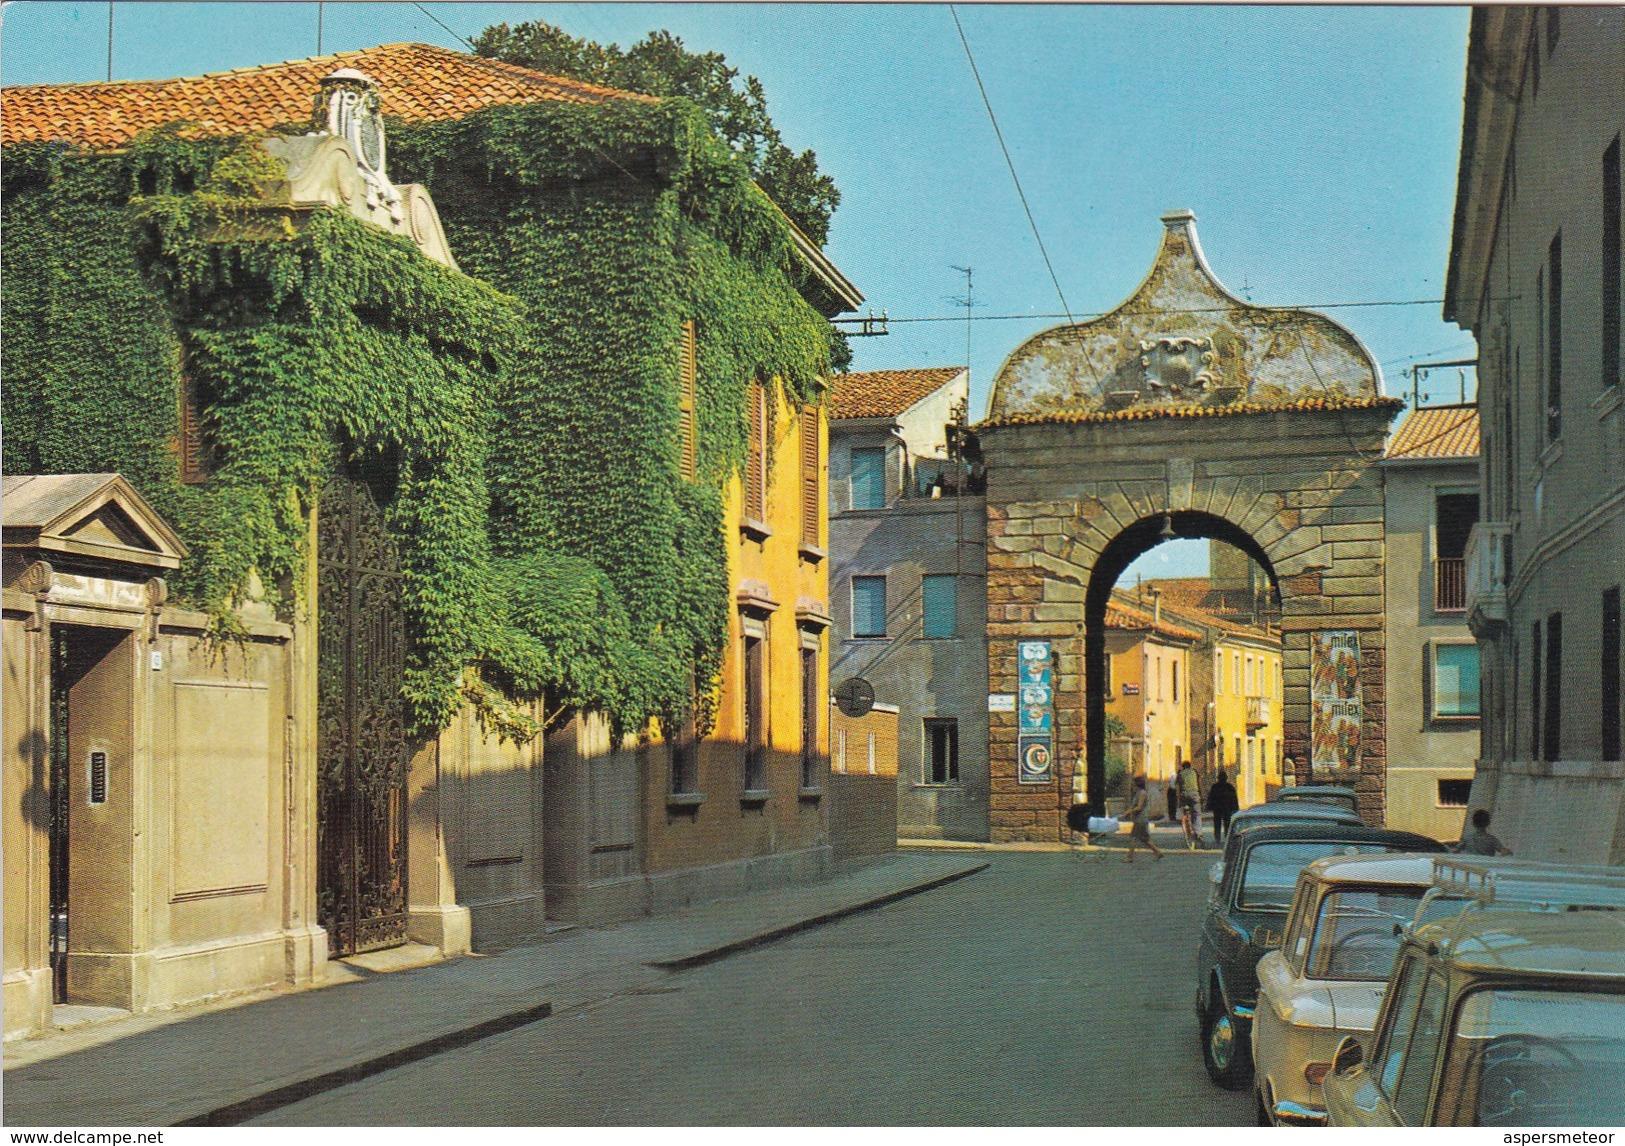 ROVIGO,VENETO.PUERTA S AGOSTINO  - ITALIA/L'ITALIE/ITALY - CIRCA 1980S - BLEUP - Rovigo